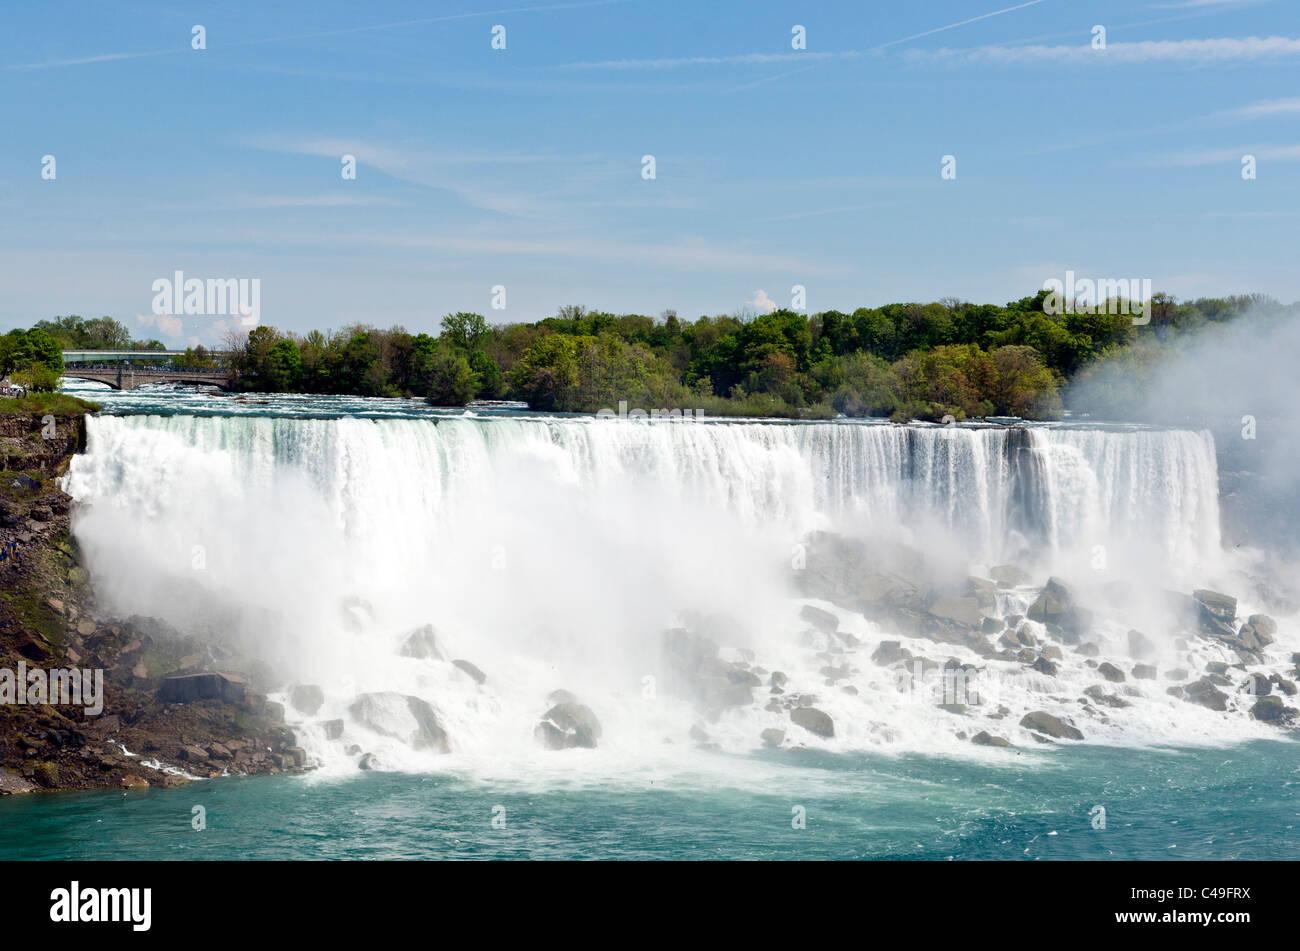 Niagara Falls View Of Us Side Ontario Canada Stock Photo Alamy